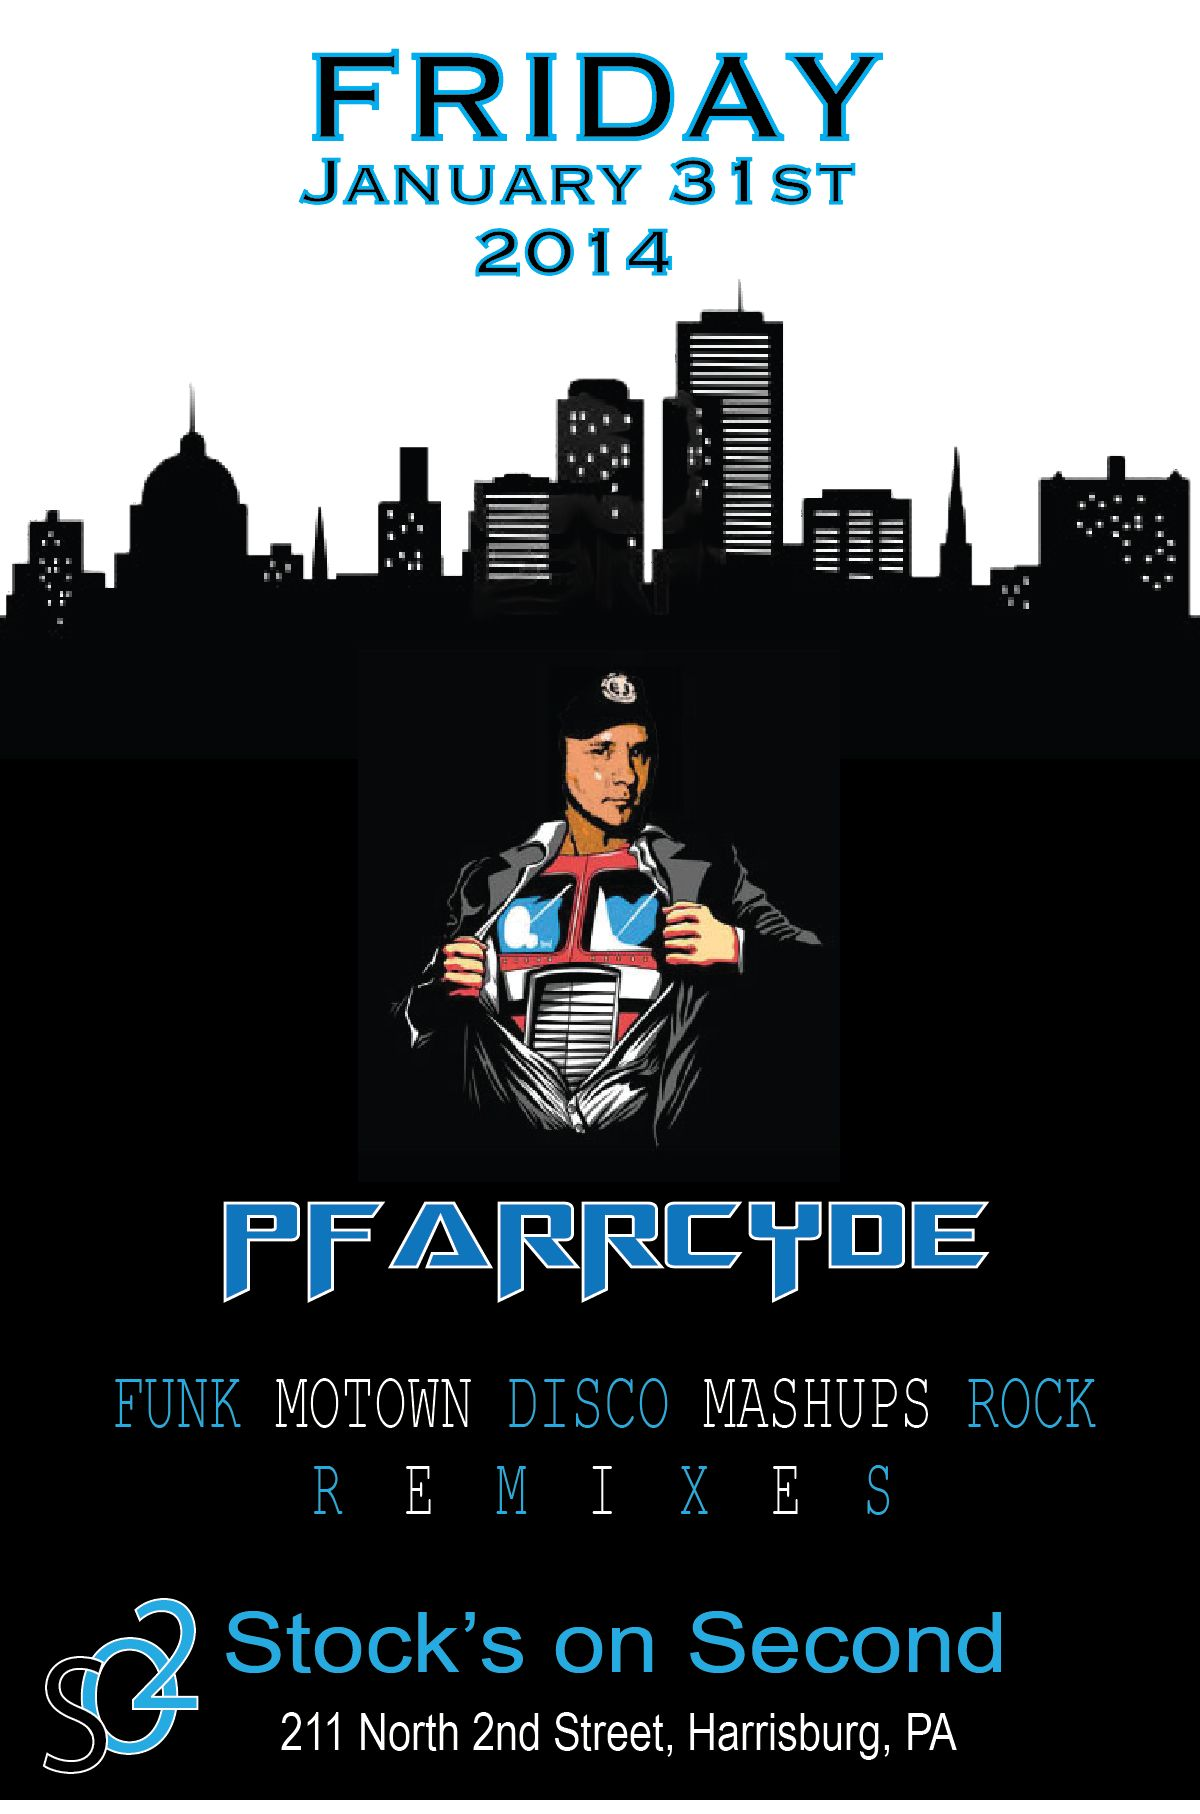 DJ Pfarrcyde Stock's on 2nd. Jan. 31st 2014 Vintage